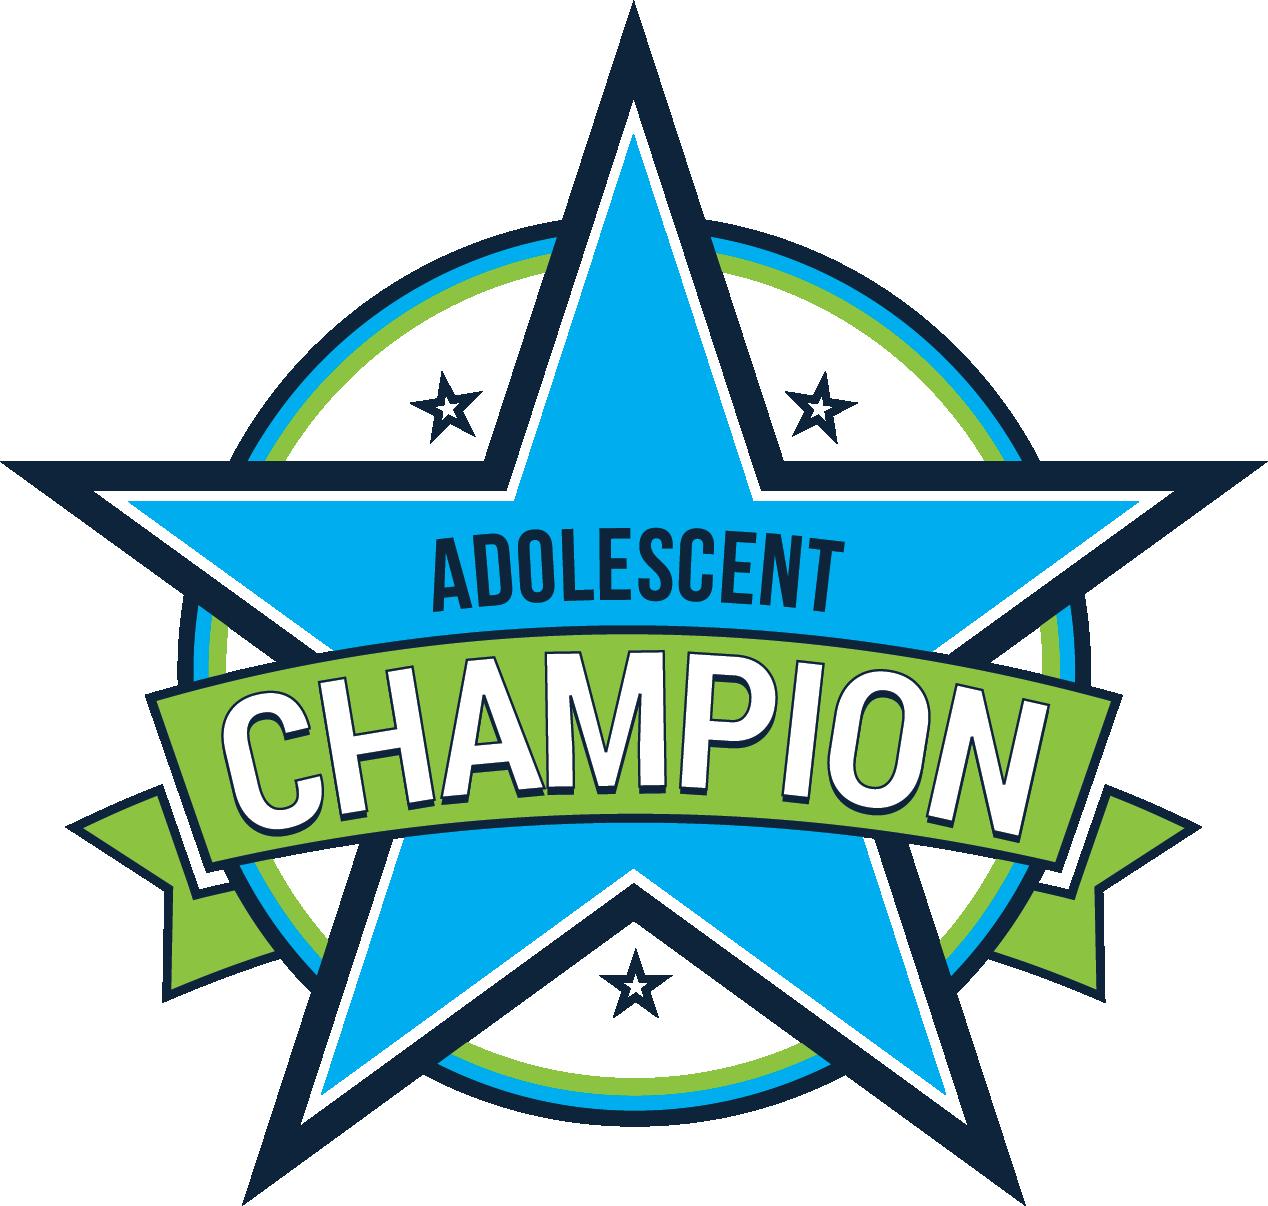 adolescentchampion_transparent